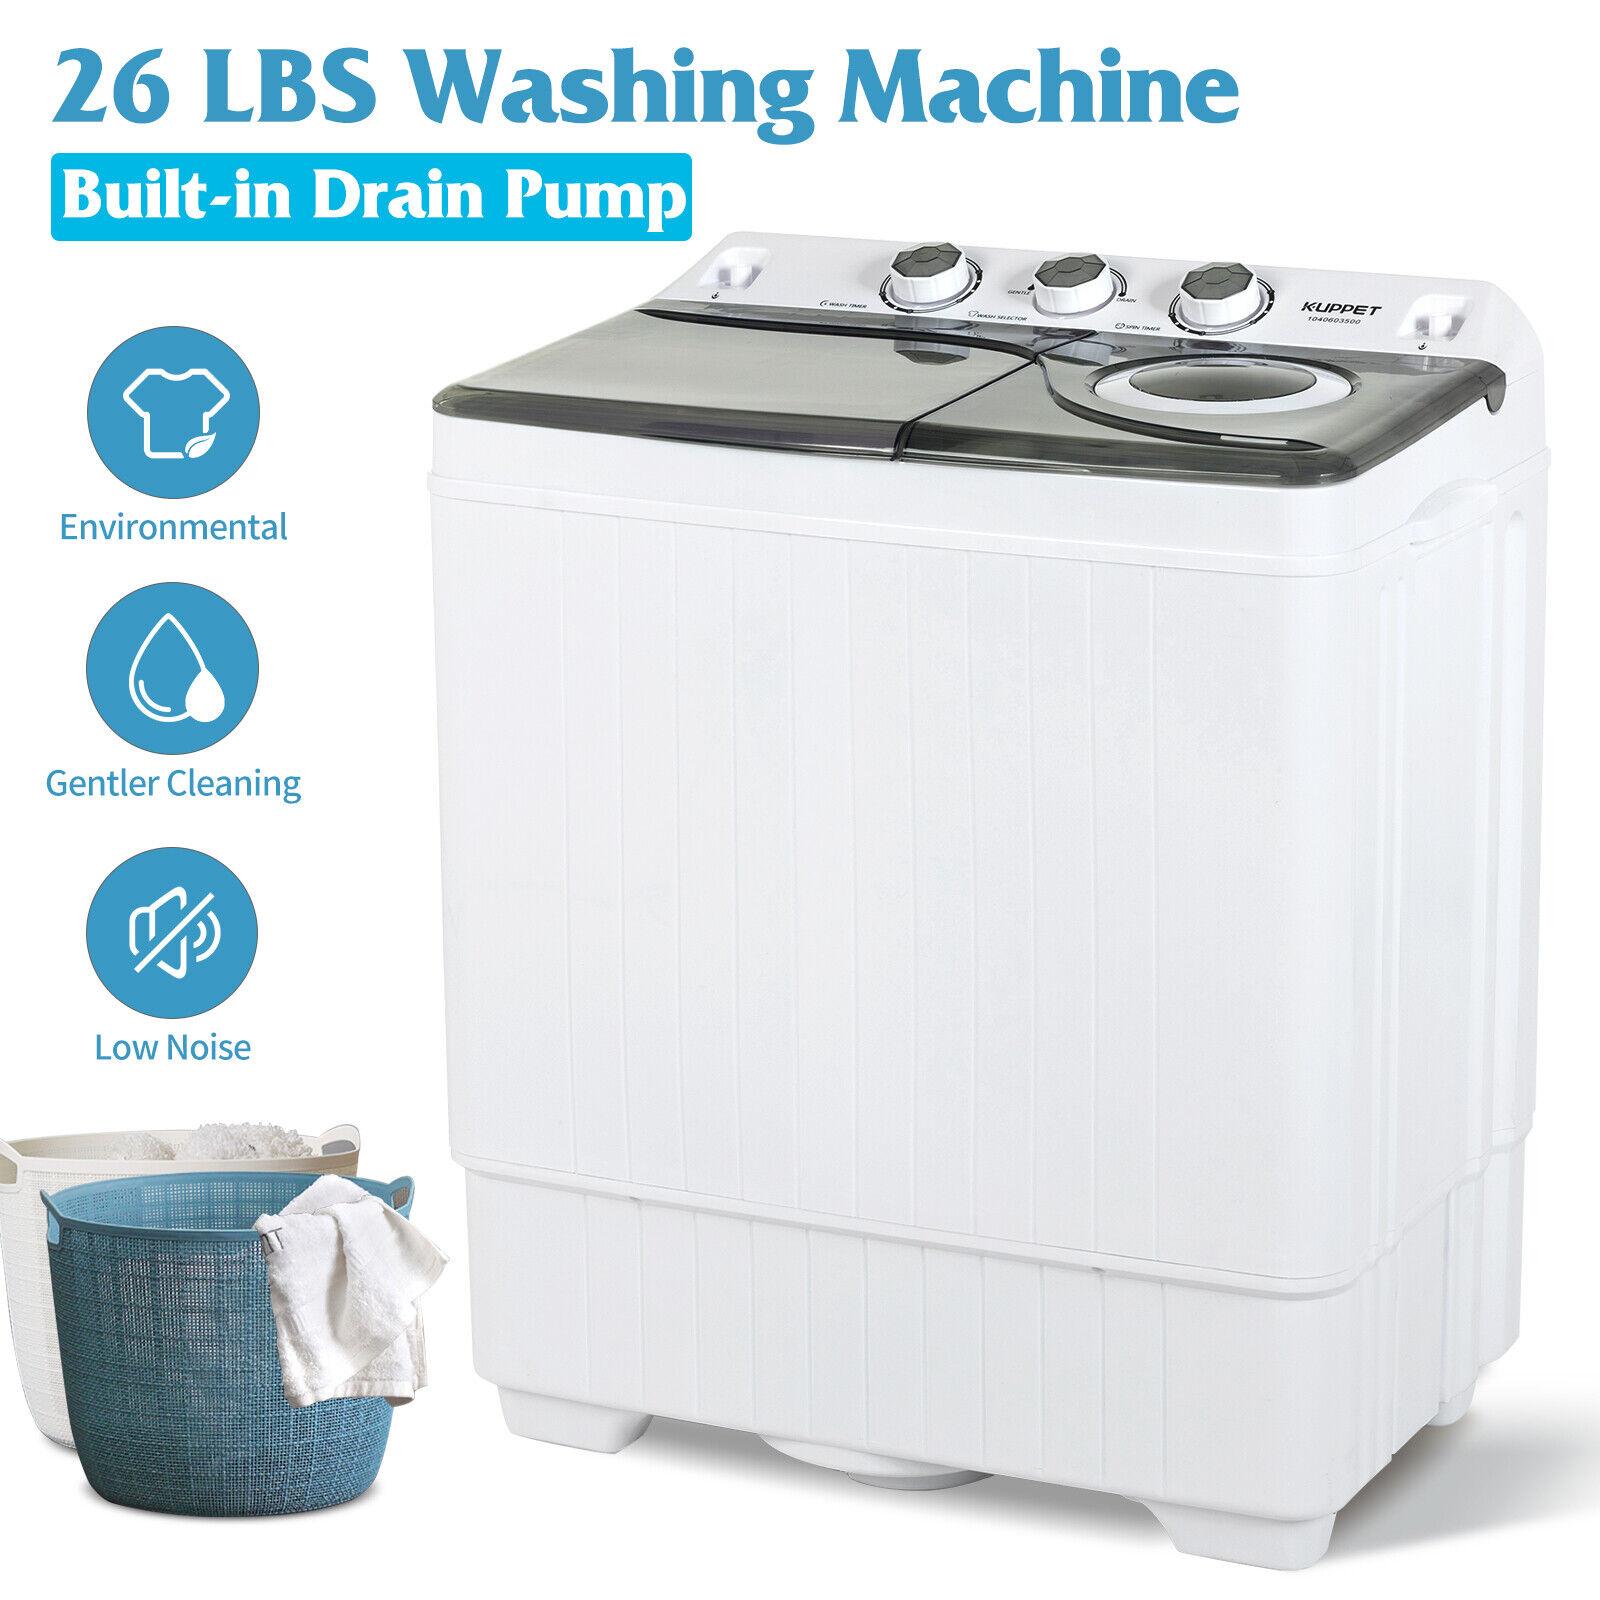 26 LBS Portable Washing Machine Compact Twin Tub Laundry Spi